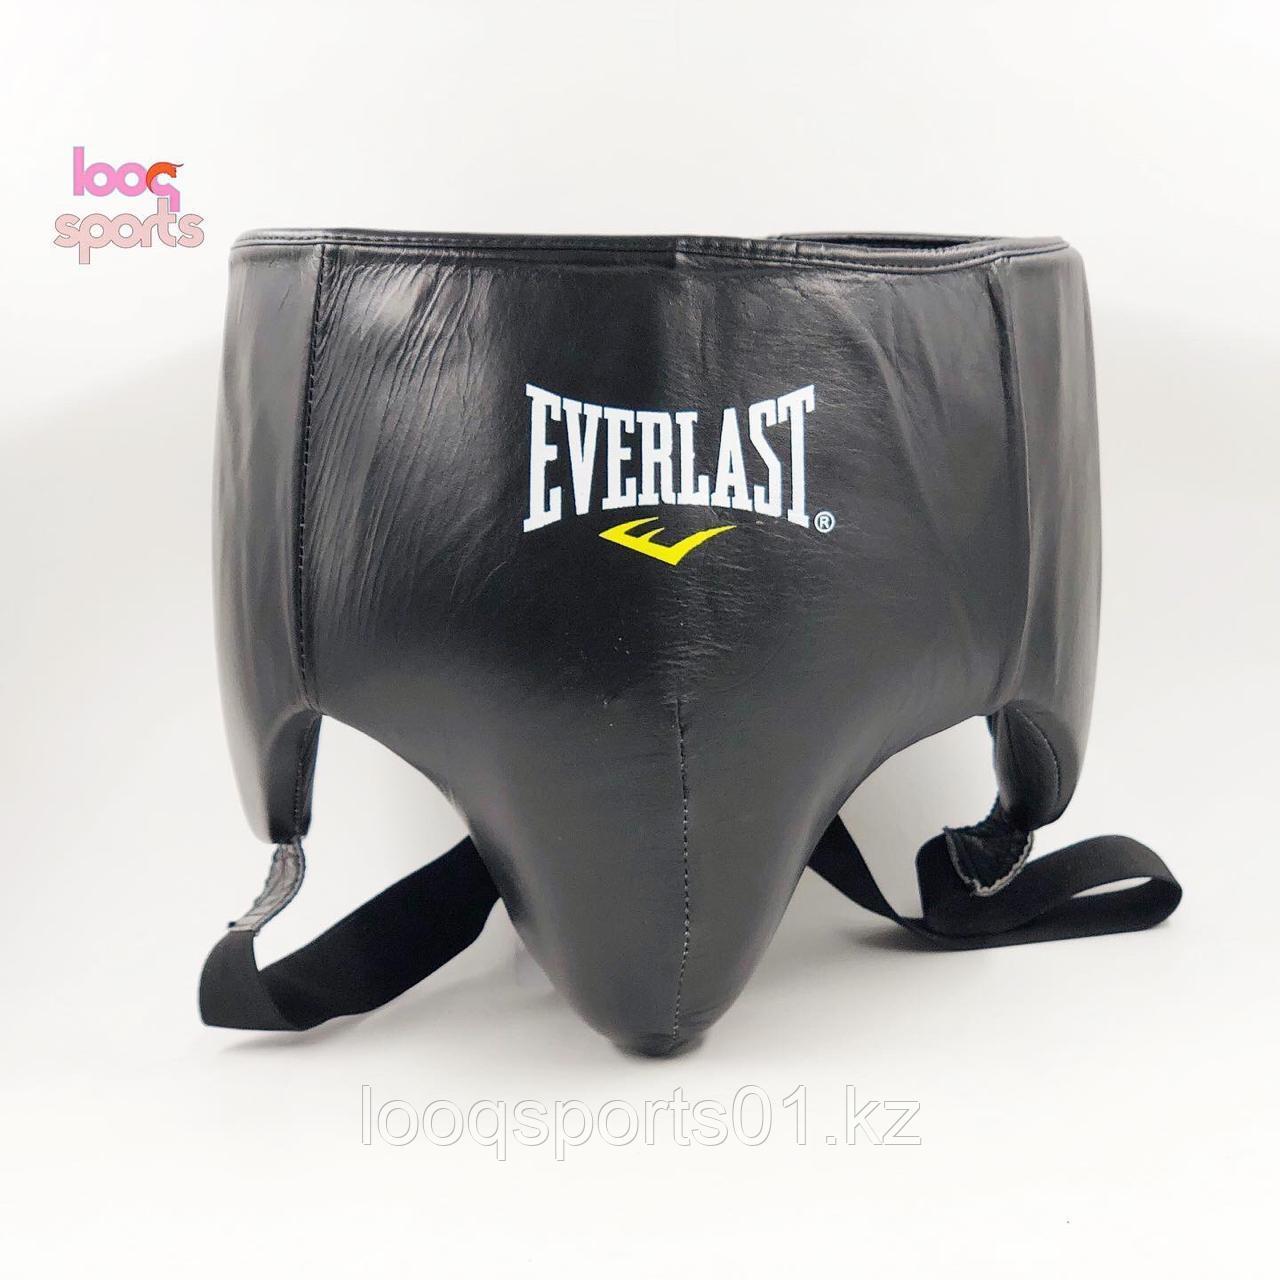 Бандаж для бокса (защита паха)